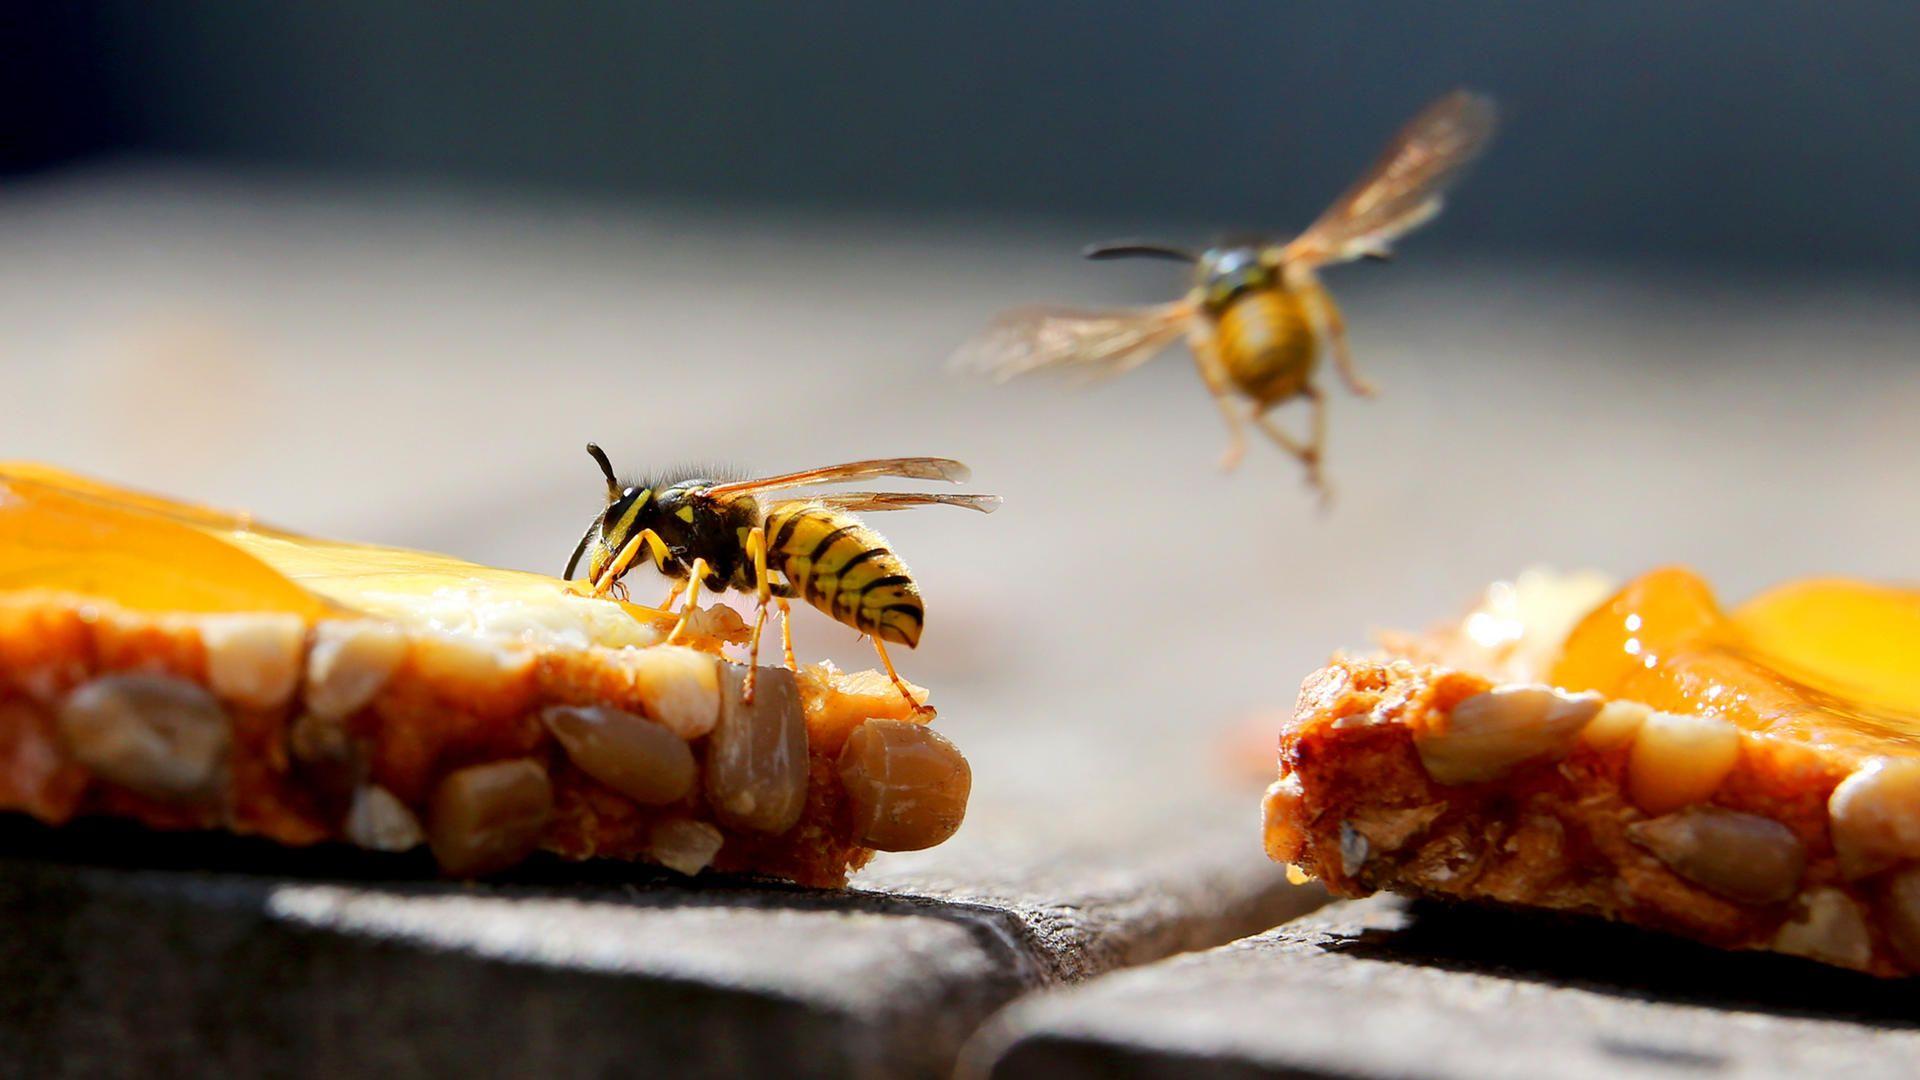 Kaffee Trick Hilft Gegen Lastige Wespen Lebensmittel Essen Essen Nahrung